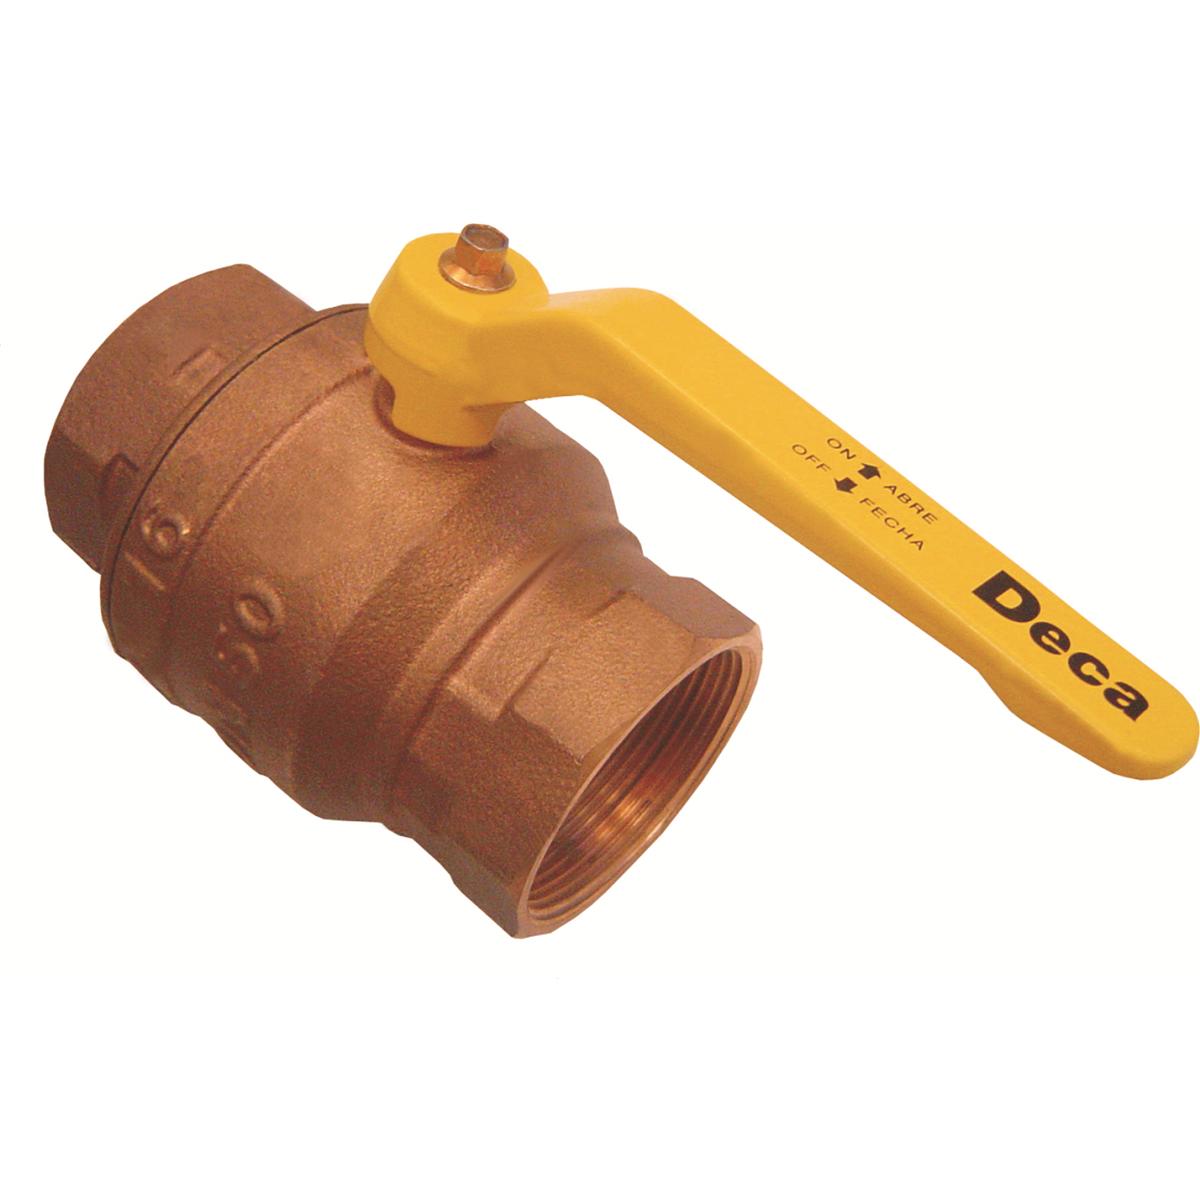 Registro Esfera Roscavel Liga de cobre Alavanca 20mm 34 - Deca